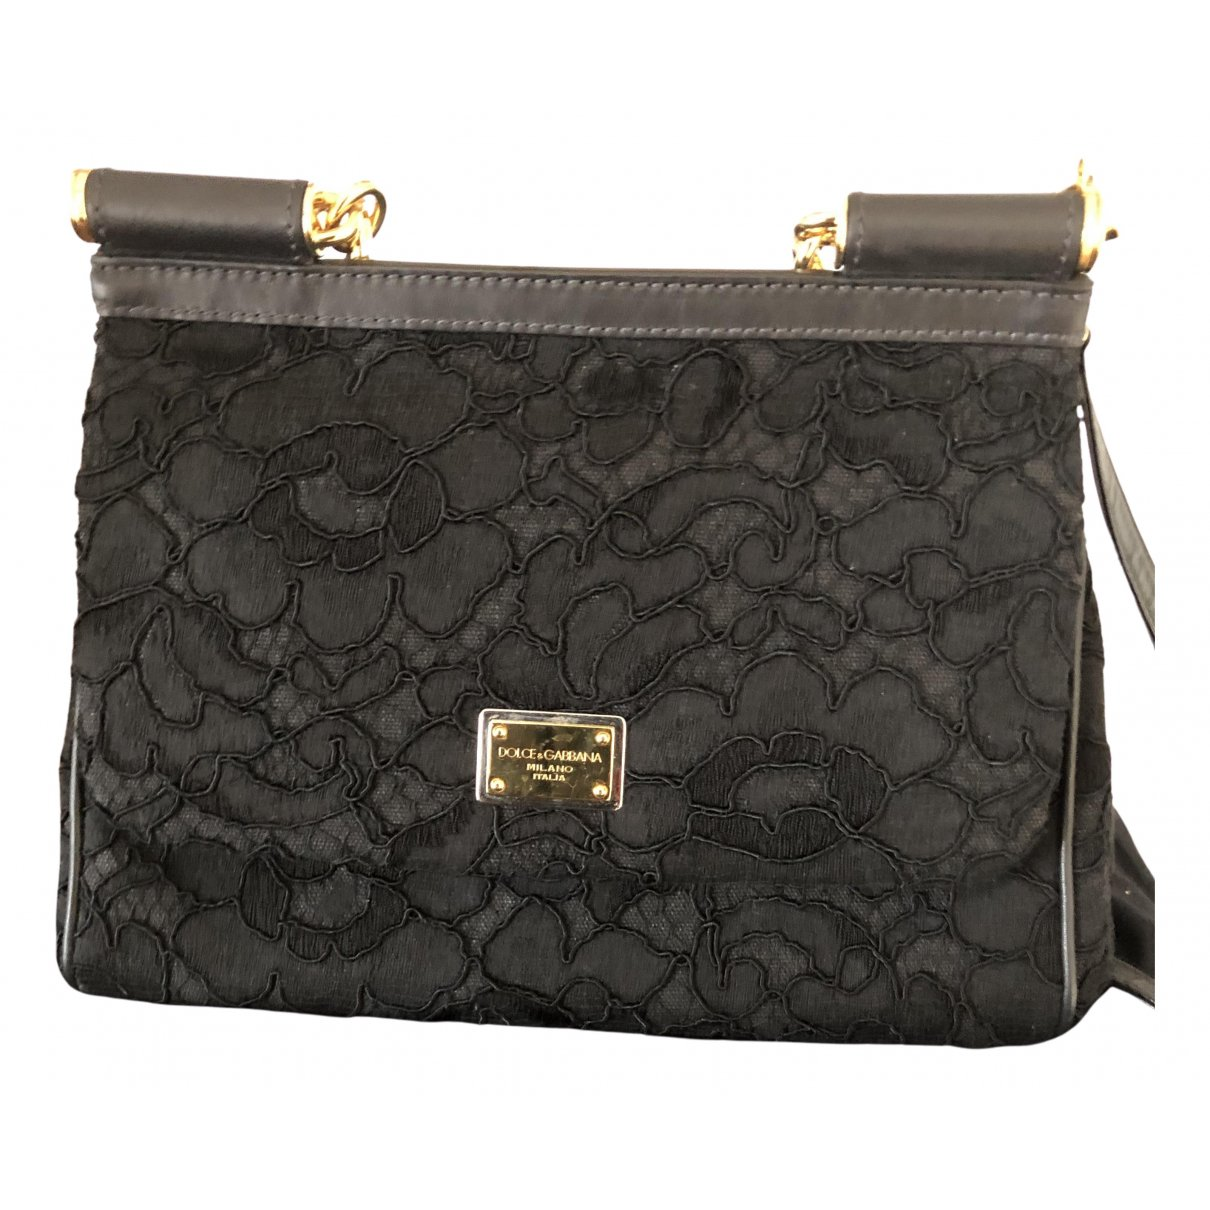 Dolce & Gabbana Sicily Black Cloth Handbag for Women